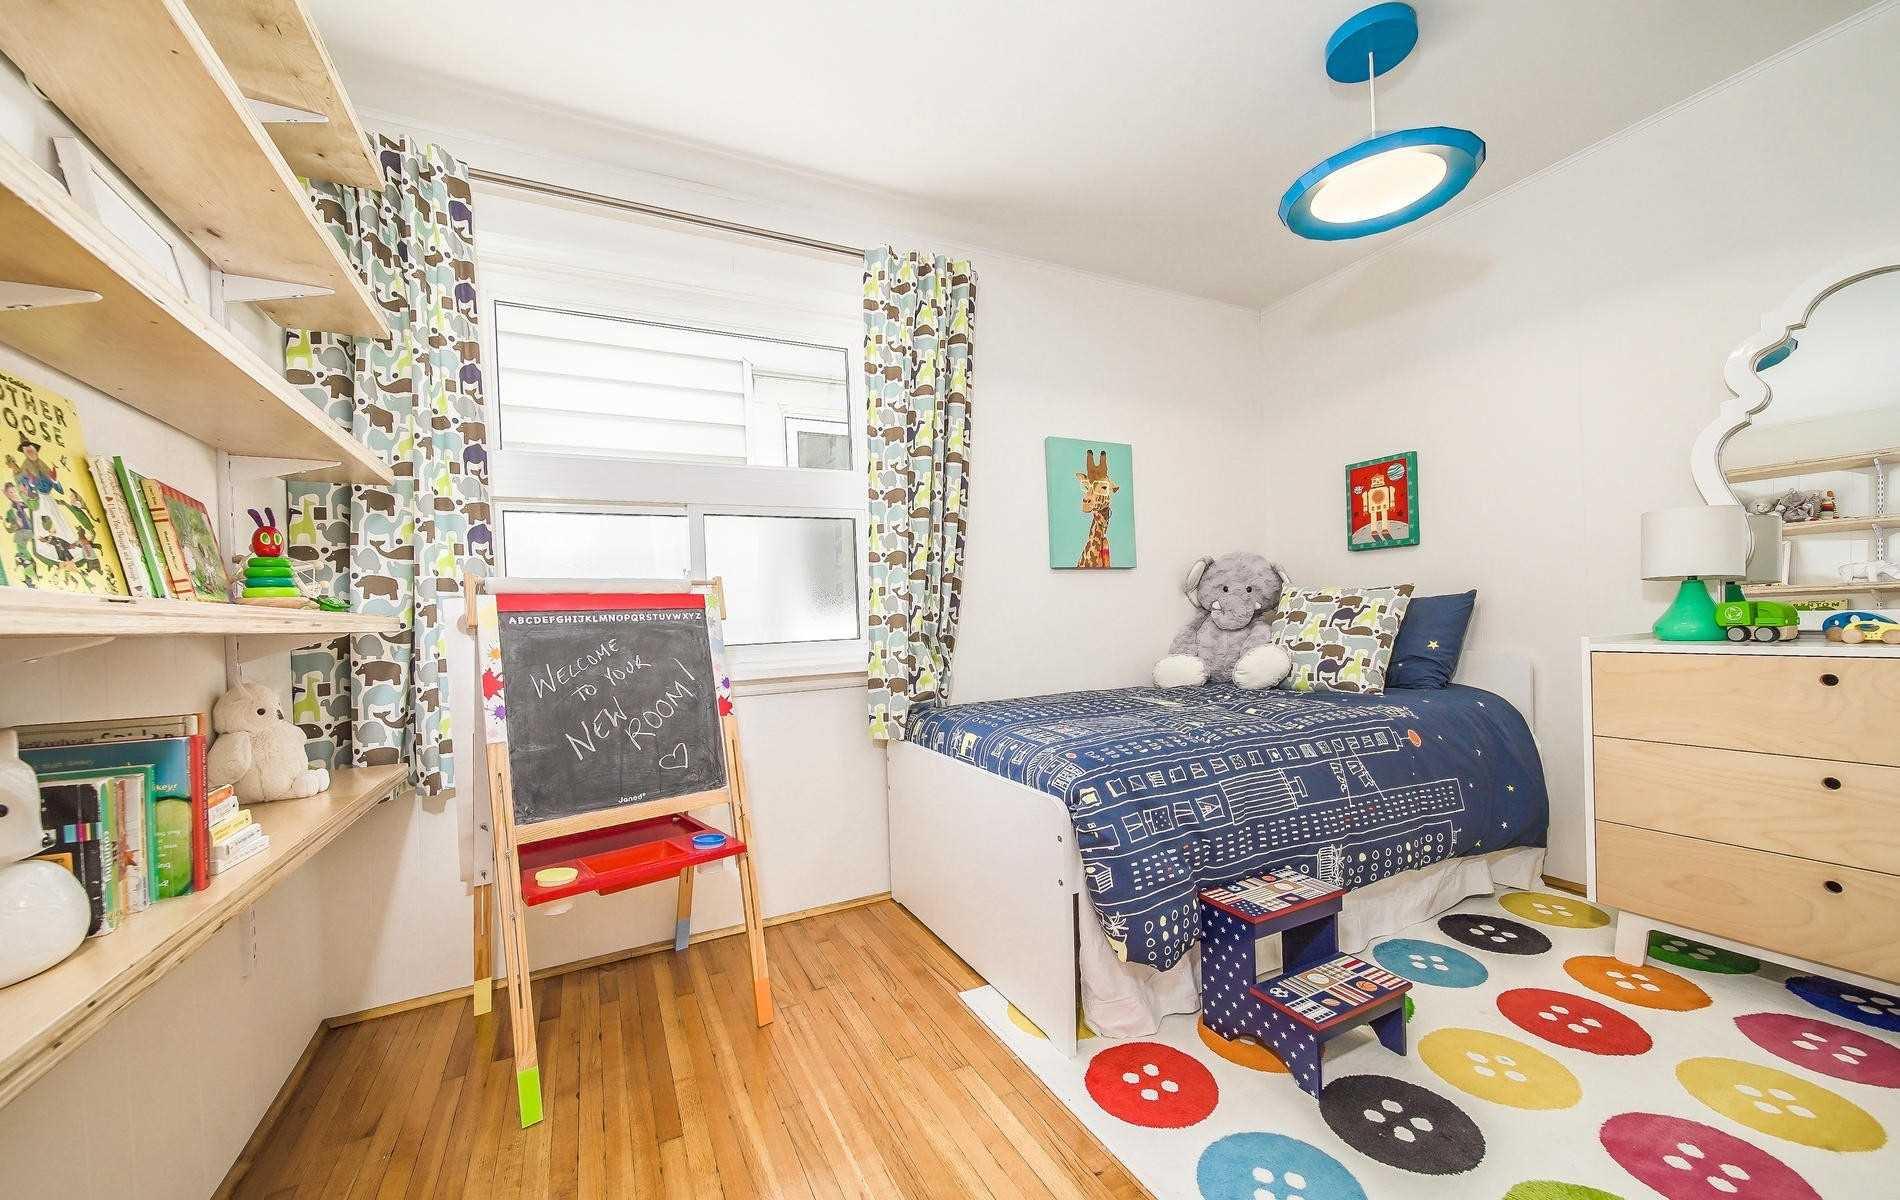 Photo 14: Photos: 64 Larchmount Avenue in Toronto: South Riverdale House (2-Storey) for sale (Toronto E01)  : MLS®# E4489752